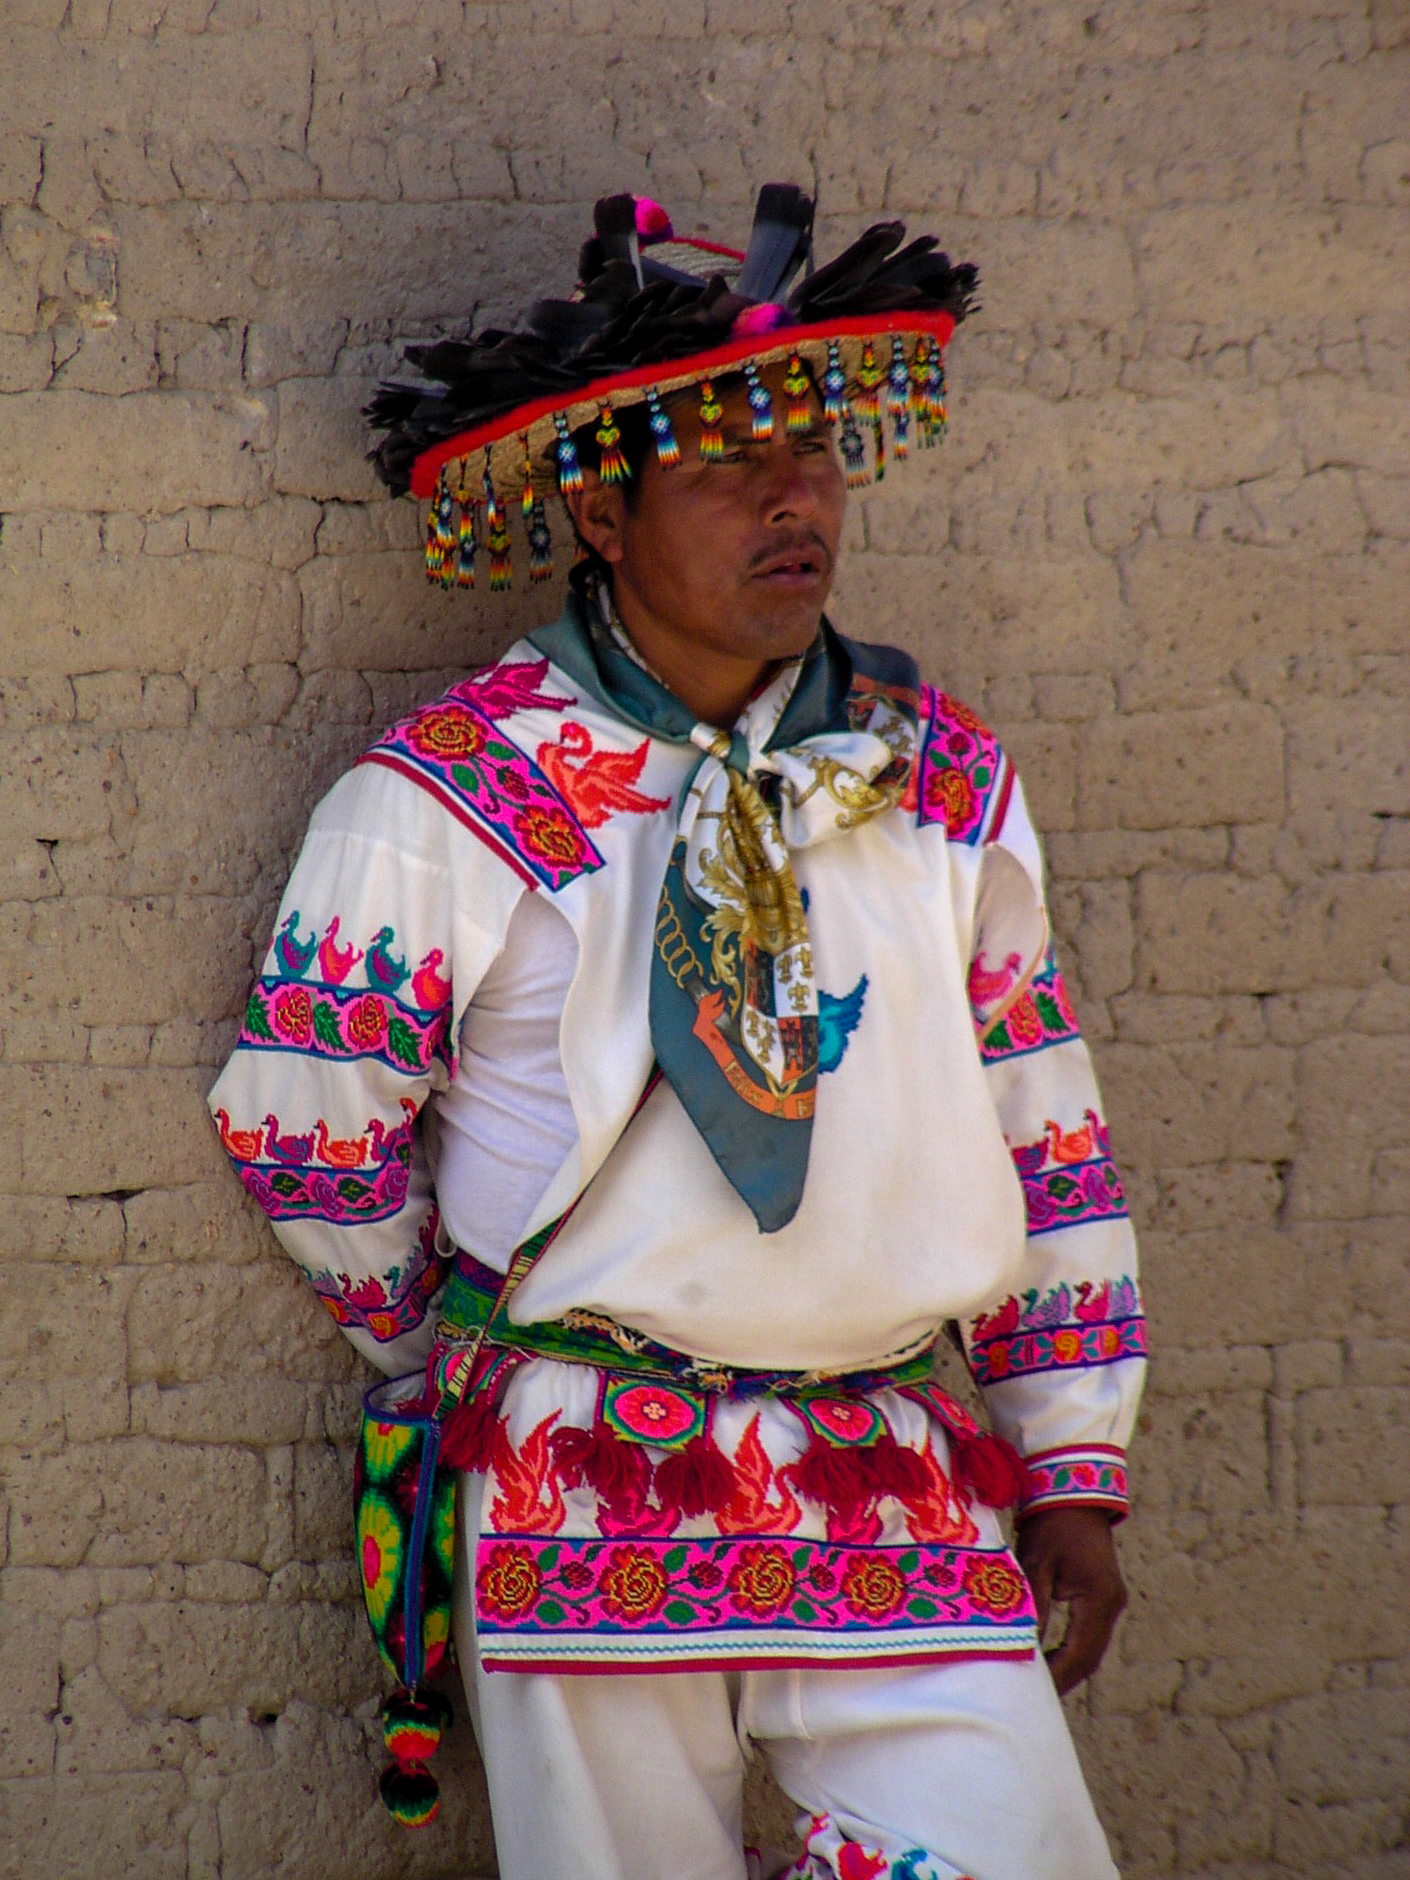 Traditional Wixarika man attire